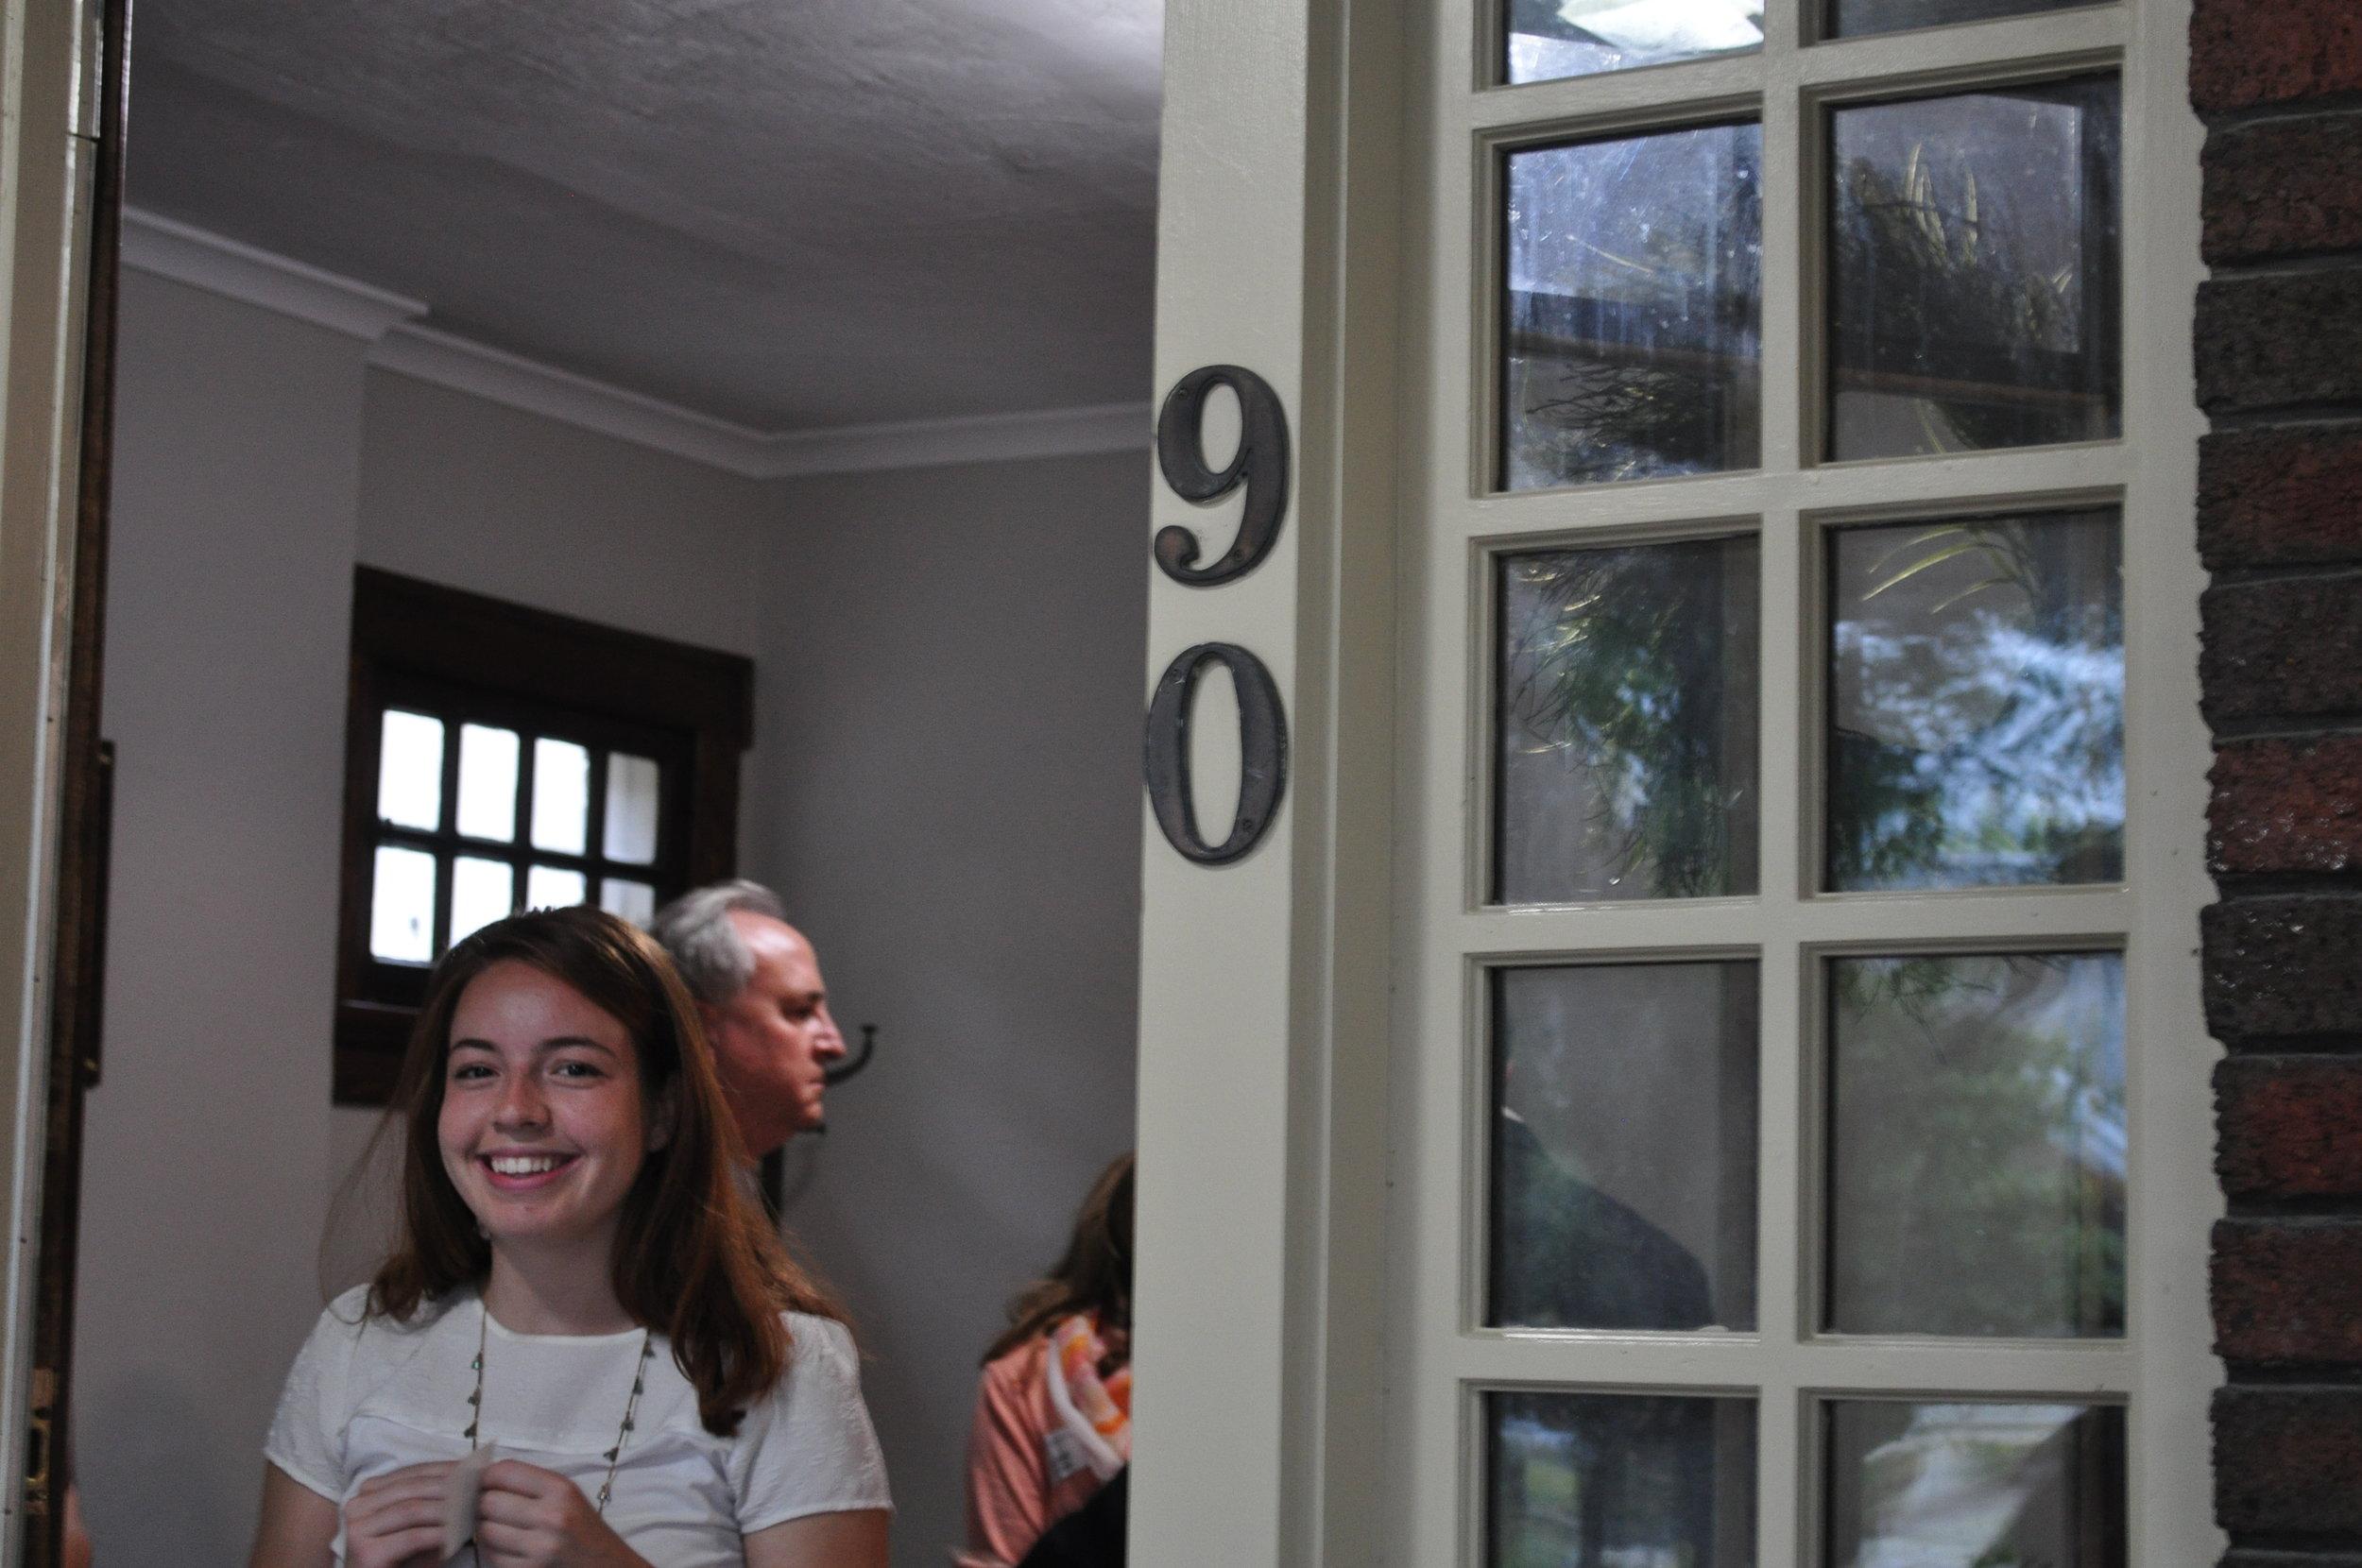 OSU Junior, Melissa, welcoming guests at Siena Grand Opening Reception and Dedication